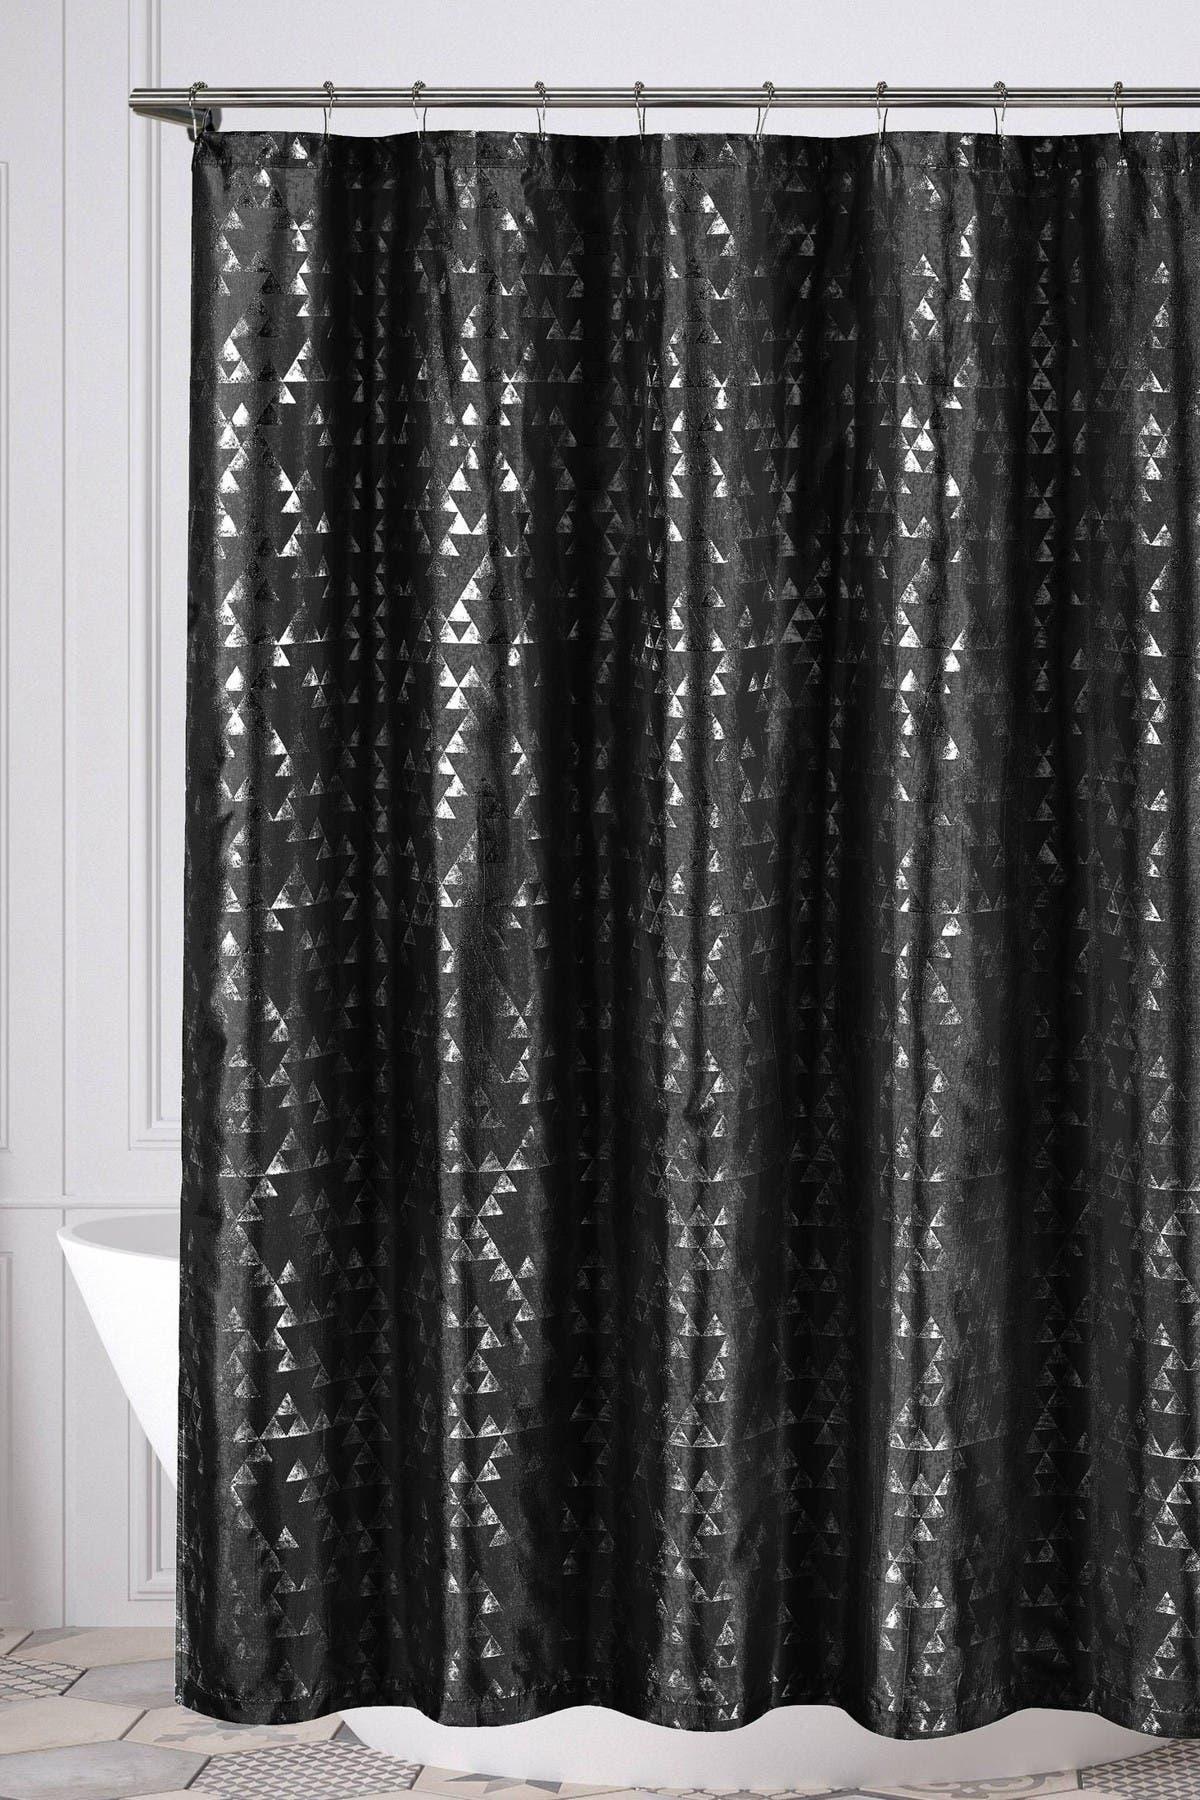 Image of Duck River Textile Juno Geometric Shower Curtain - Black